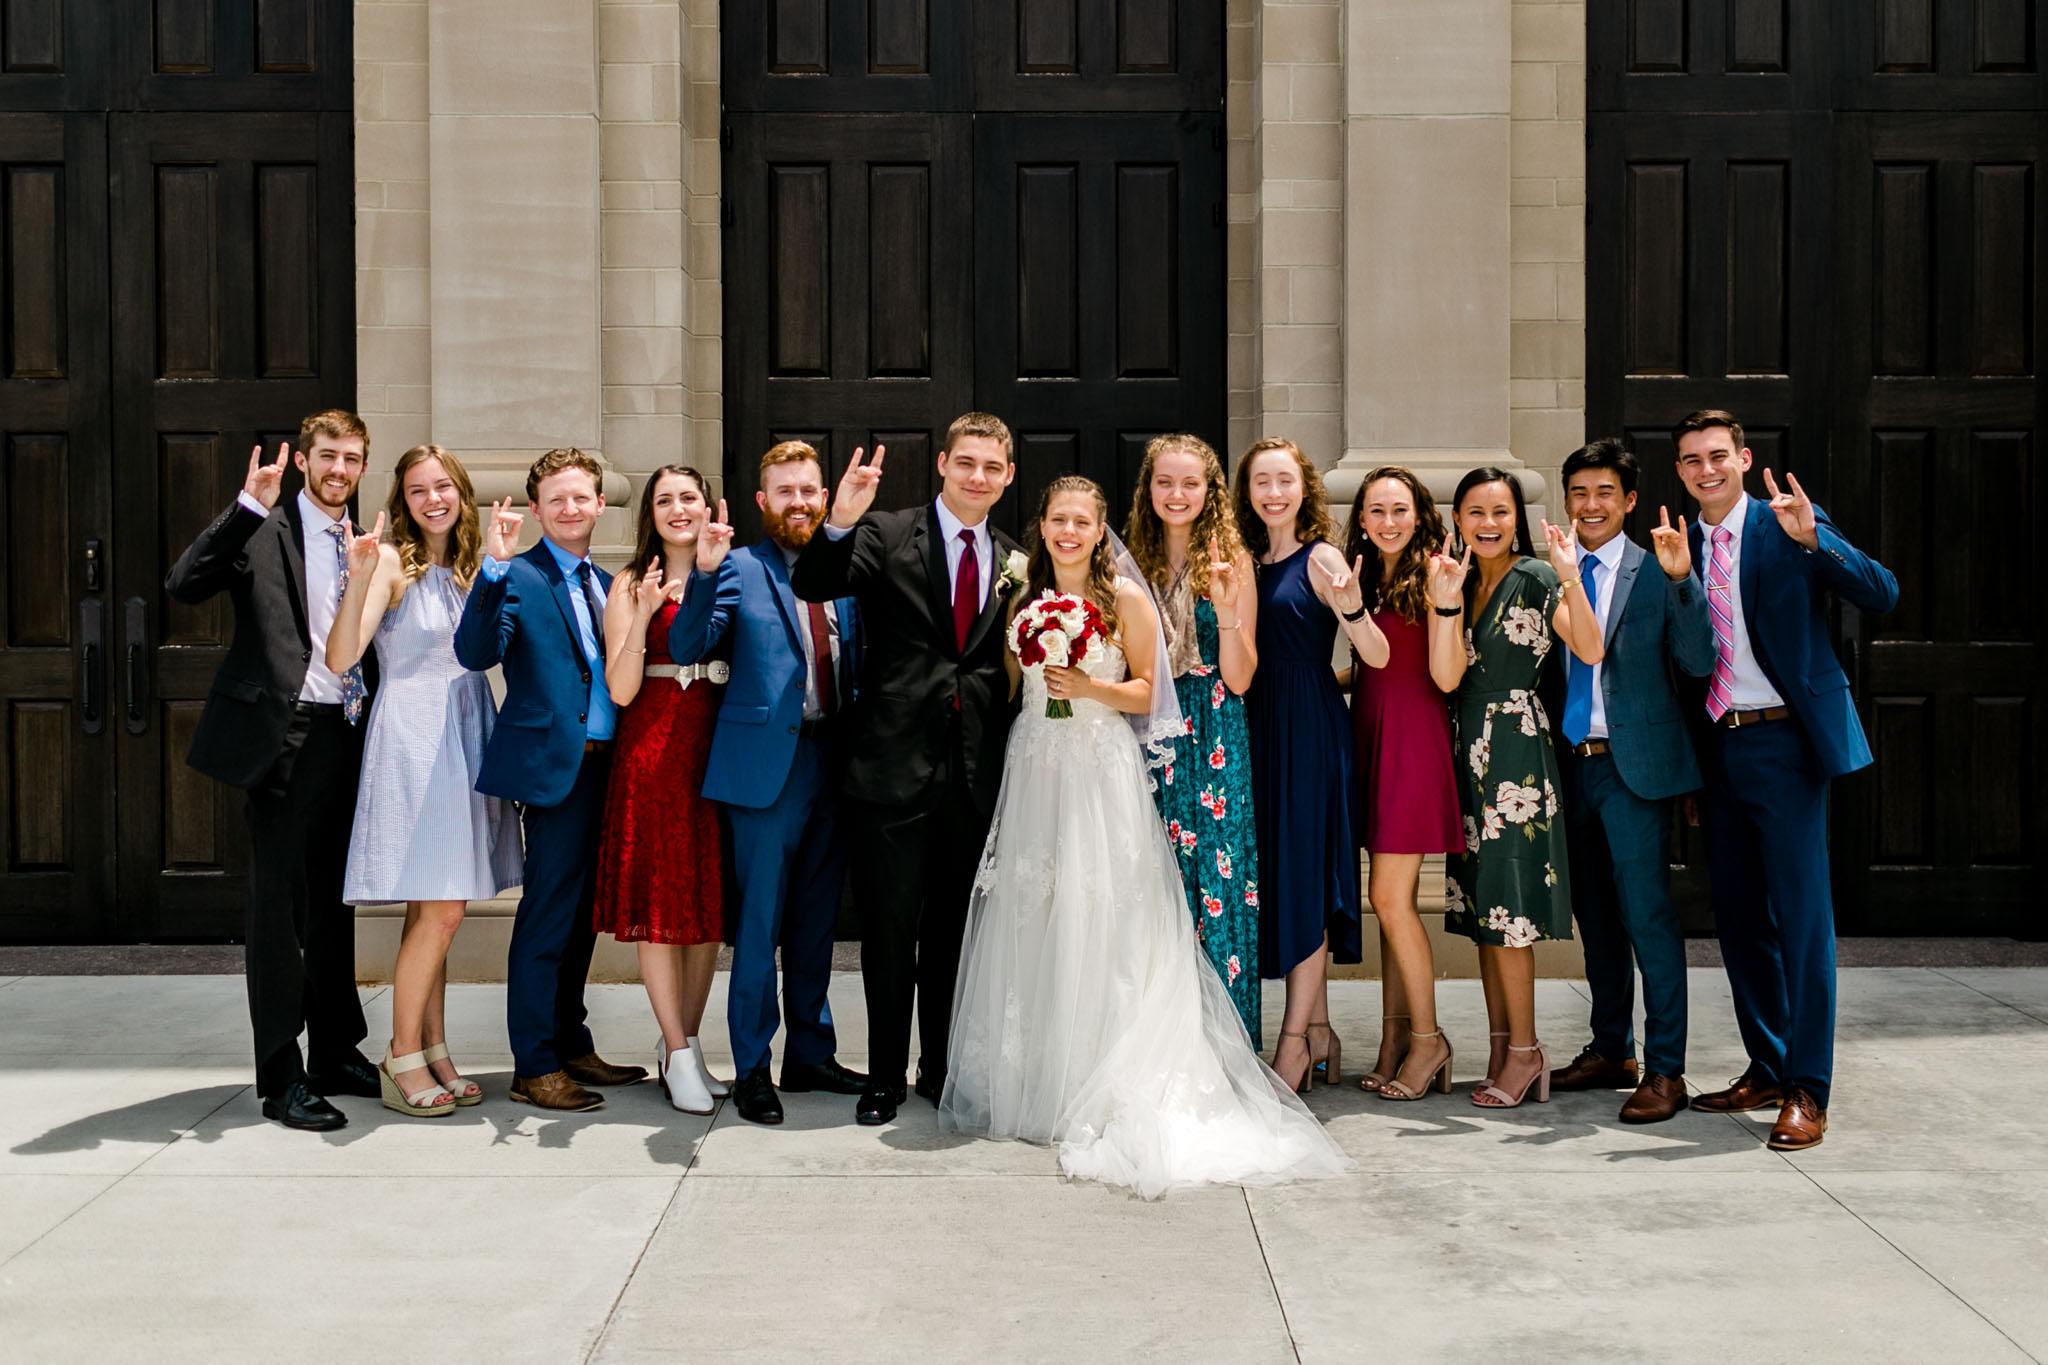 Durham-Wedding-Photographer-Portraits-24.jpg